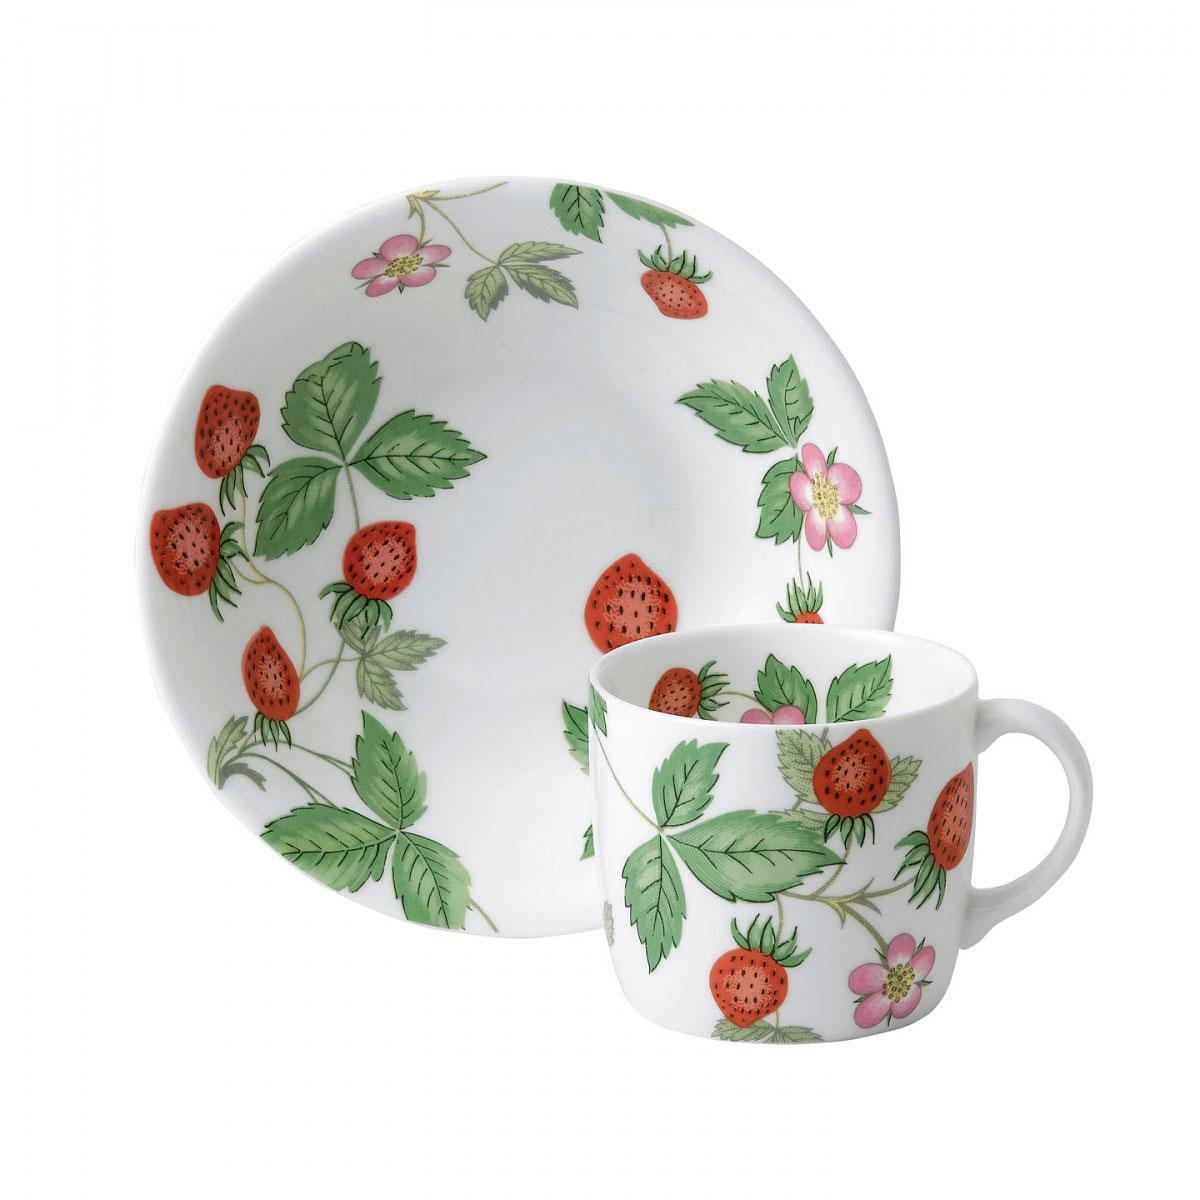 Wedgwood China Wild Strawberry Nurseryware Small Mug and Bowl 2-Piece Set